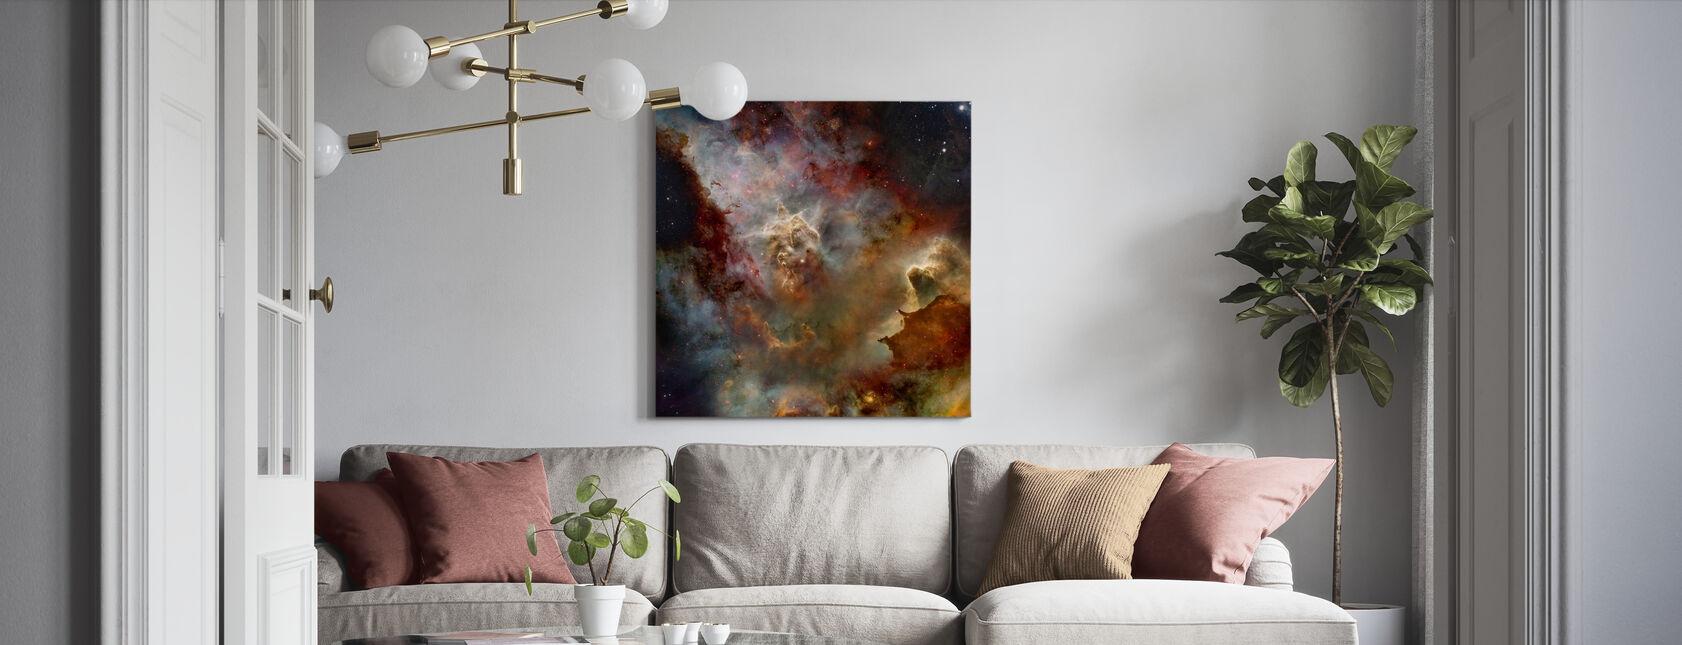 Diepe Ruimtenevel - Canvas print - Woonkamer